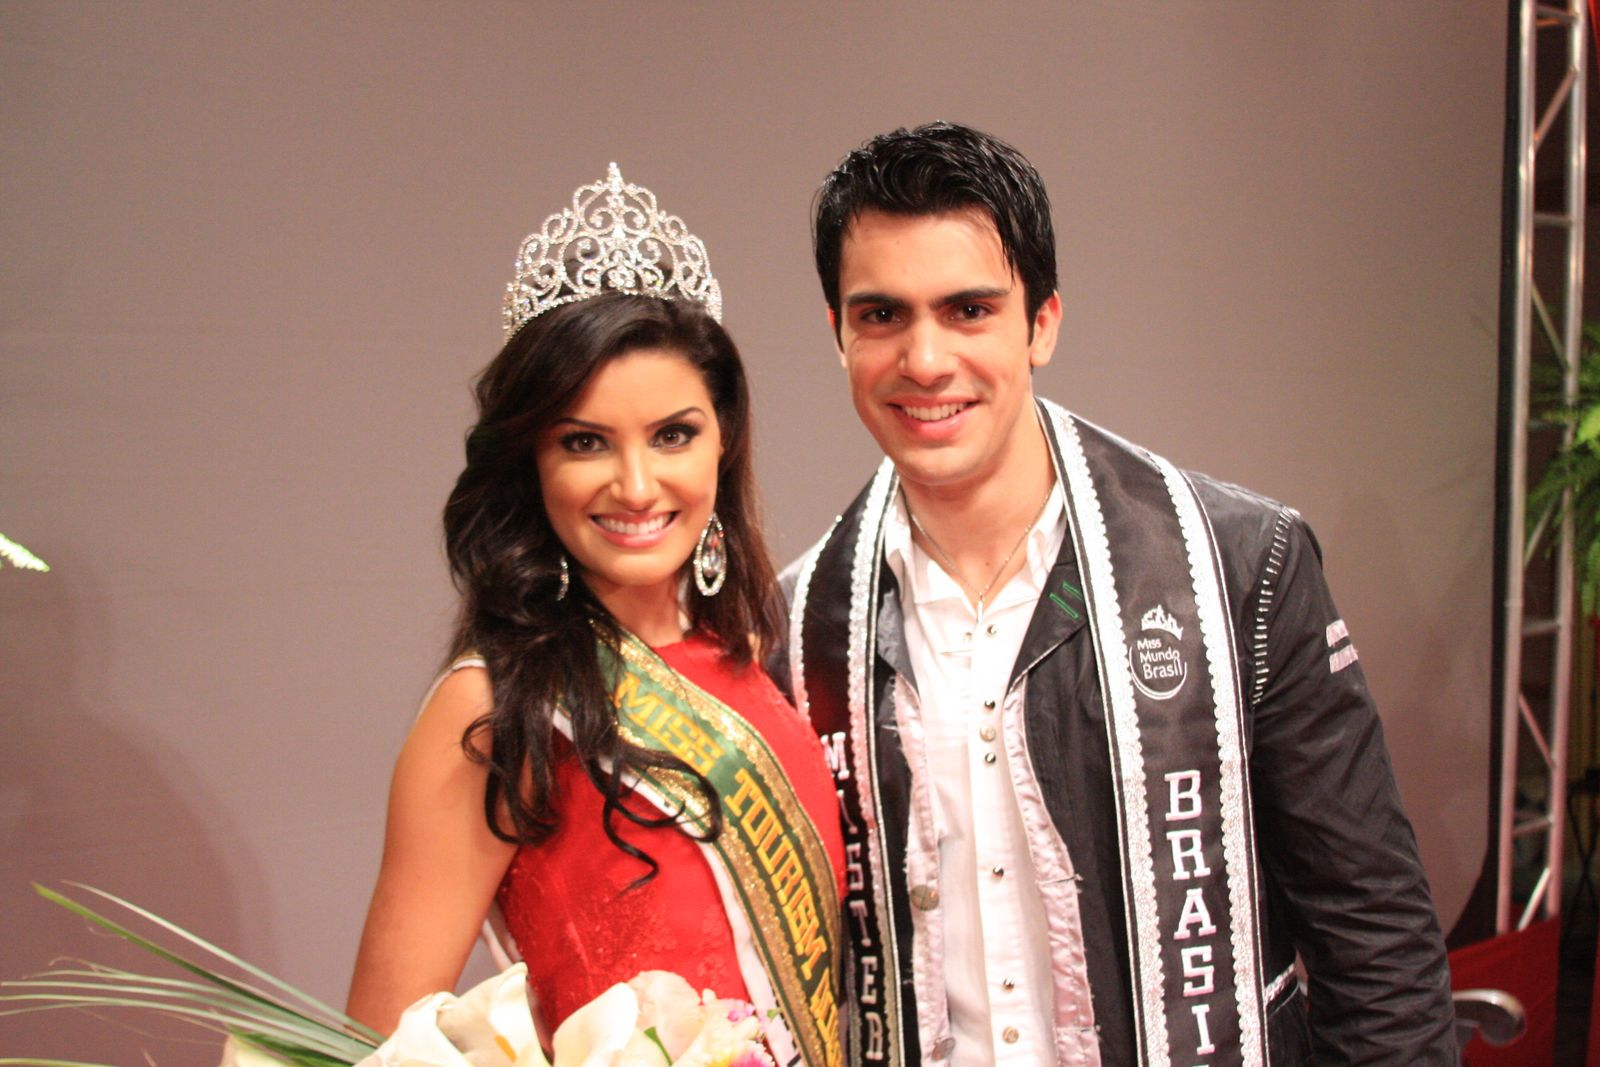 vivian noronha, rainha hispanoamericana 2008. suplente. - Página 4 Blrvd8dg